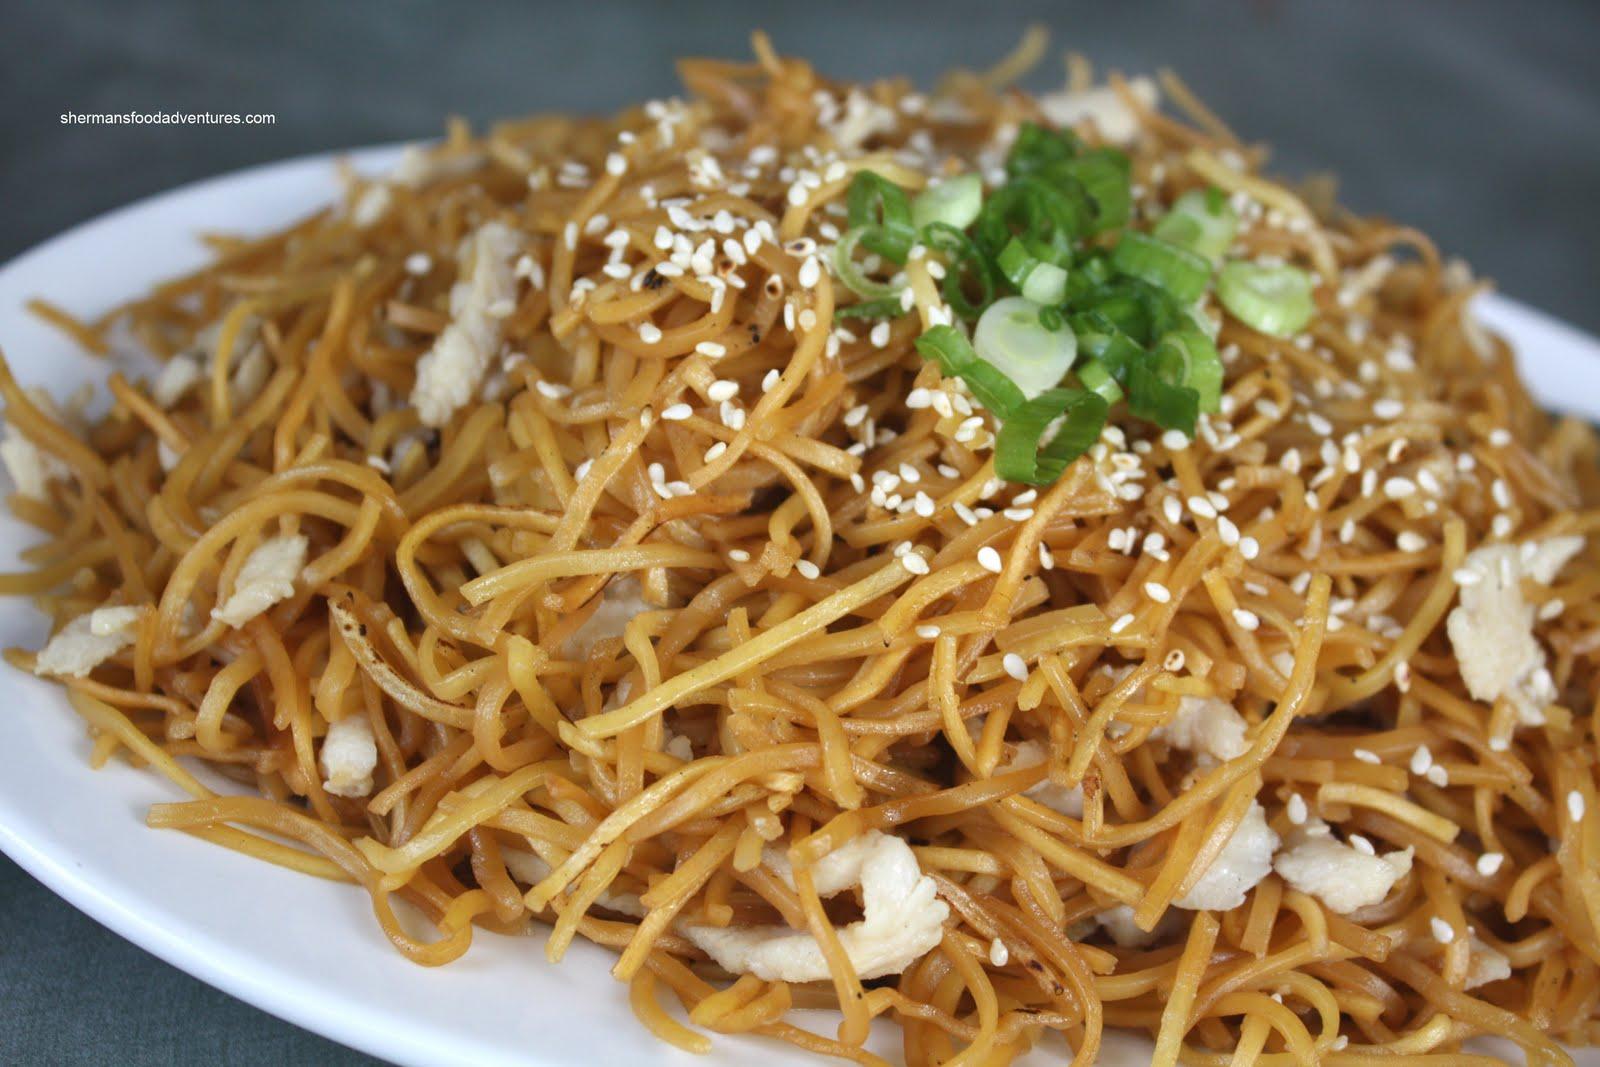 Chow Mein Chop Suey What is Chop Suey vs Chow Mein